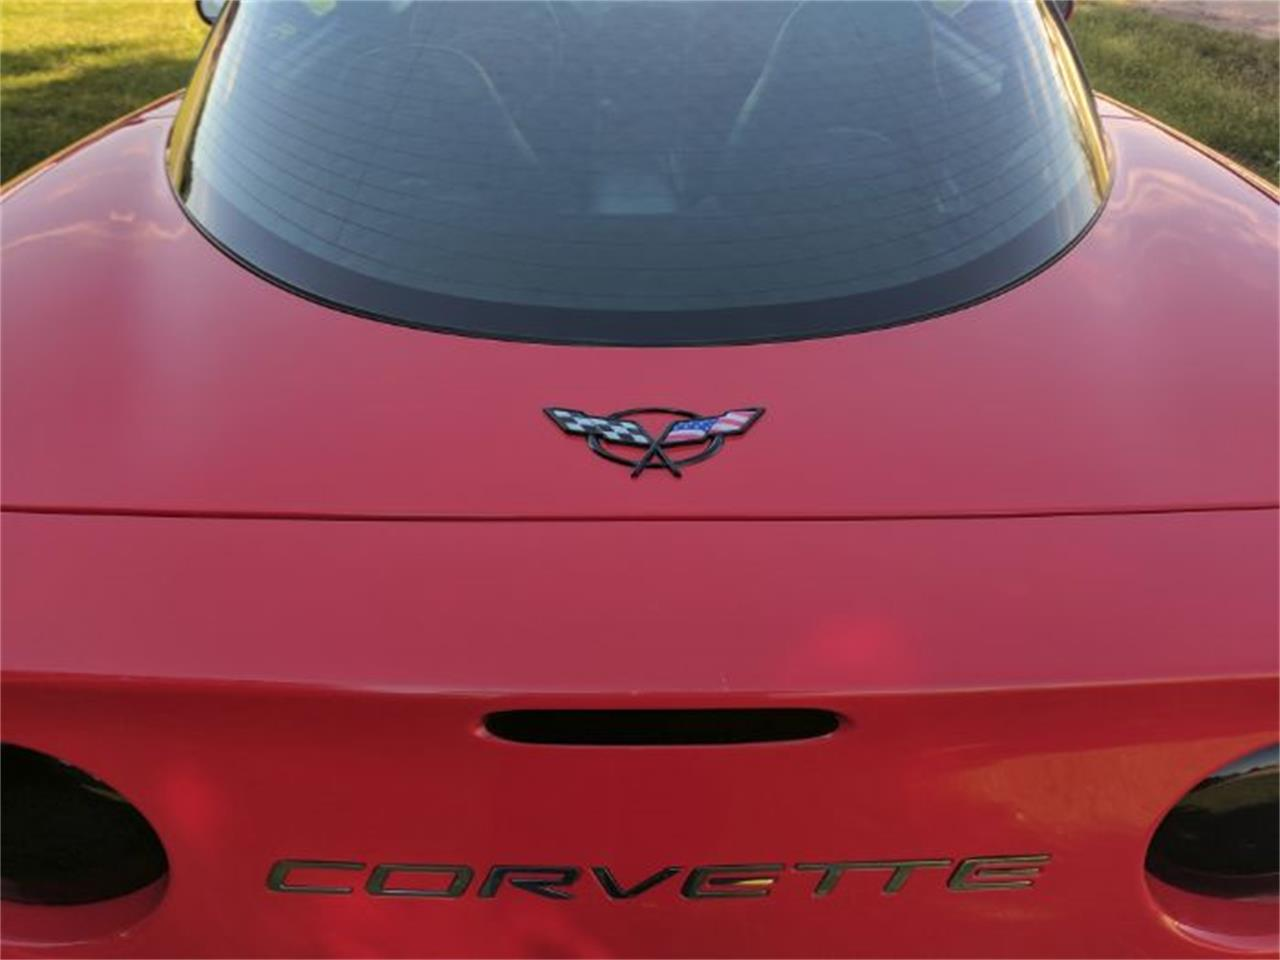 Large Picture of '00 Chevrolet Corvette located in Cadillac Michigan - $13,900.00 - L7I1